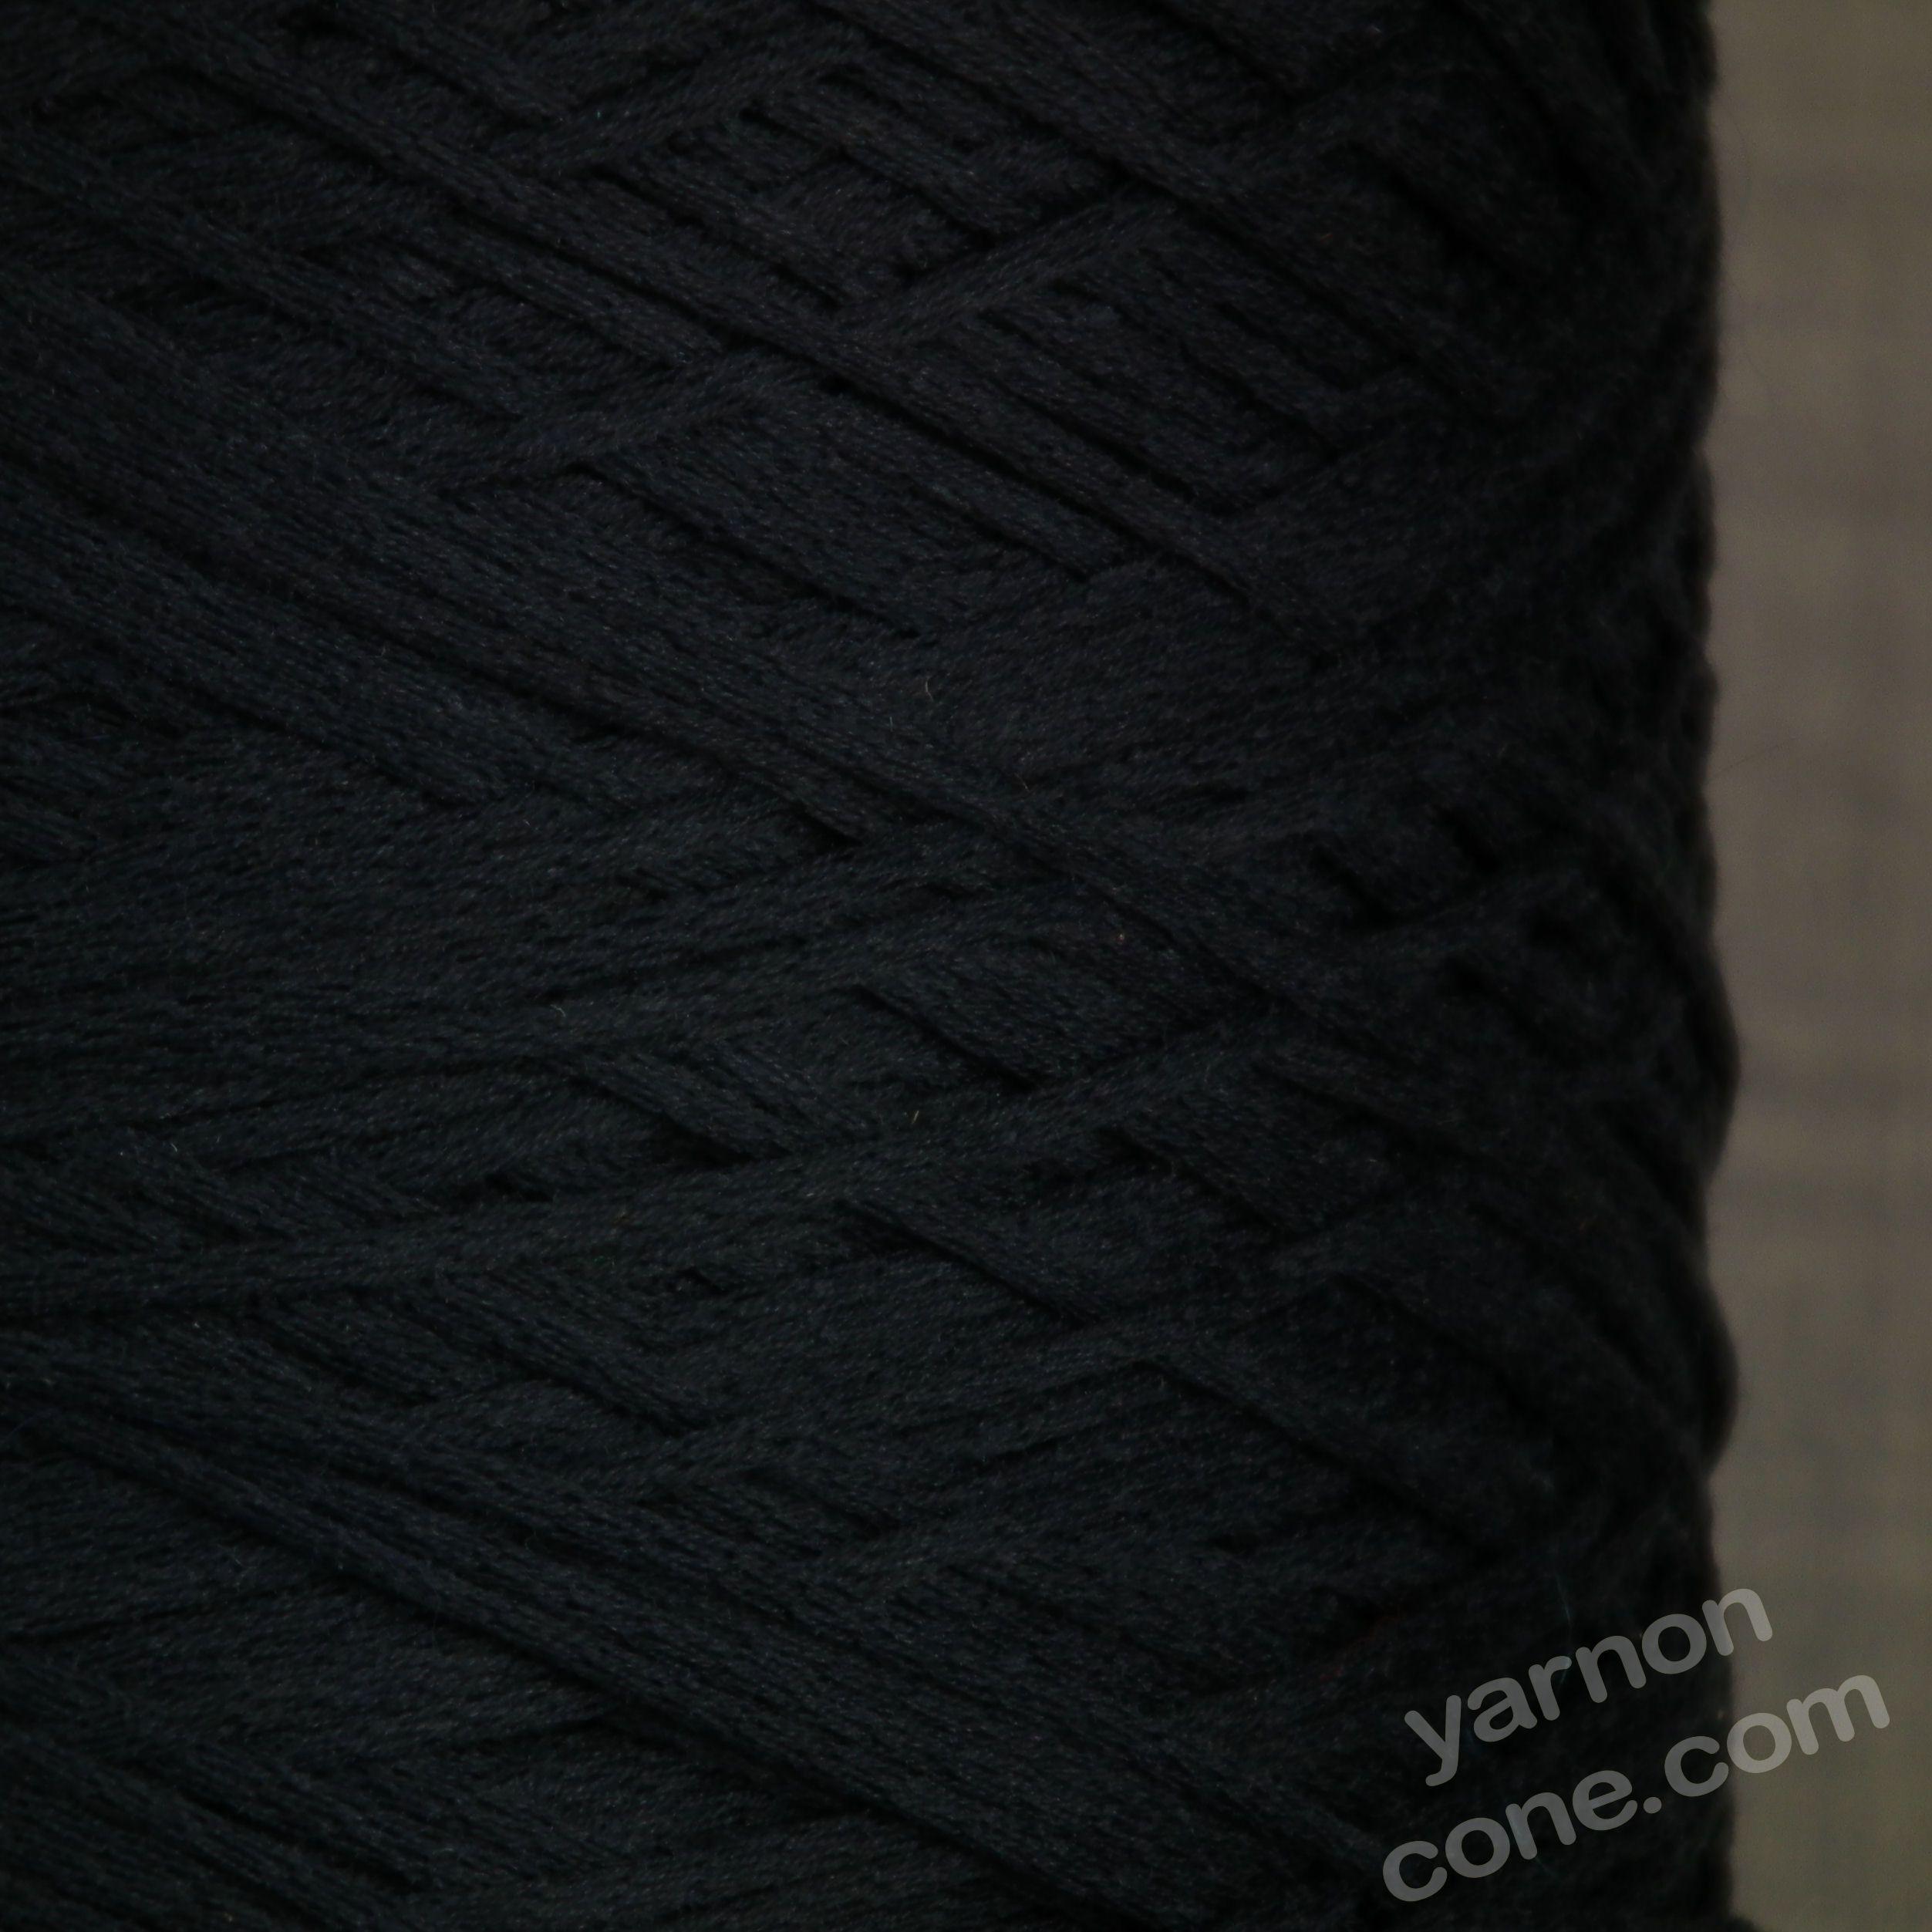 Peruvian Pima cotton 4 ply soffio soft cotton yarn on cone knit crochet weave navy blue